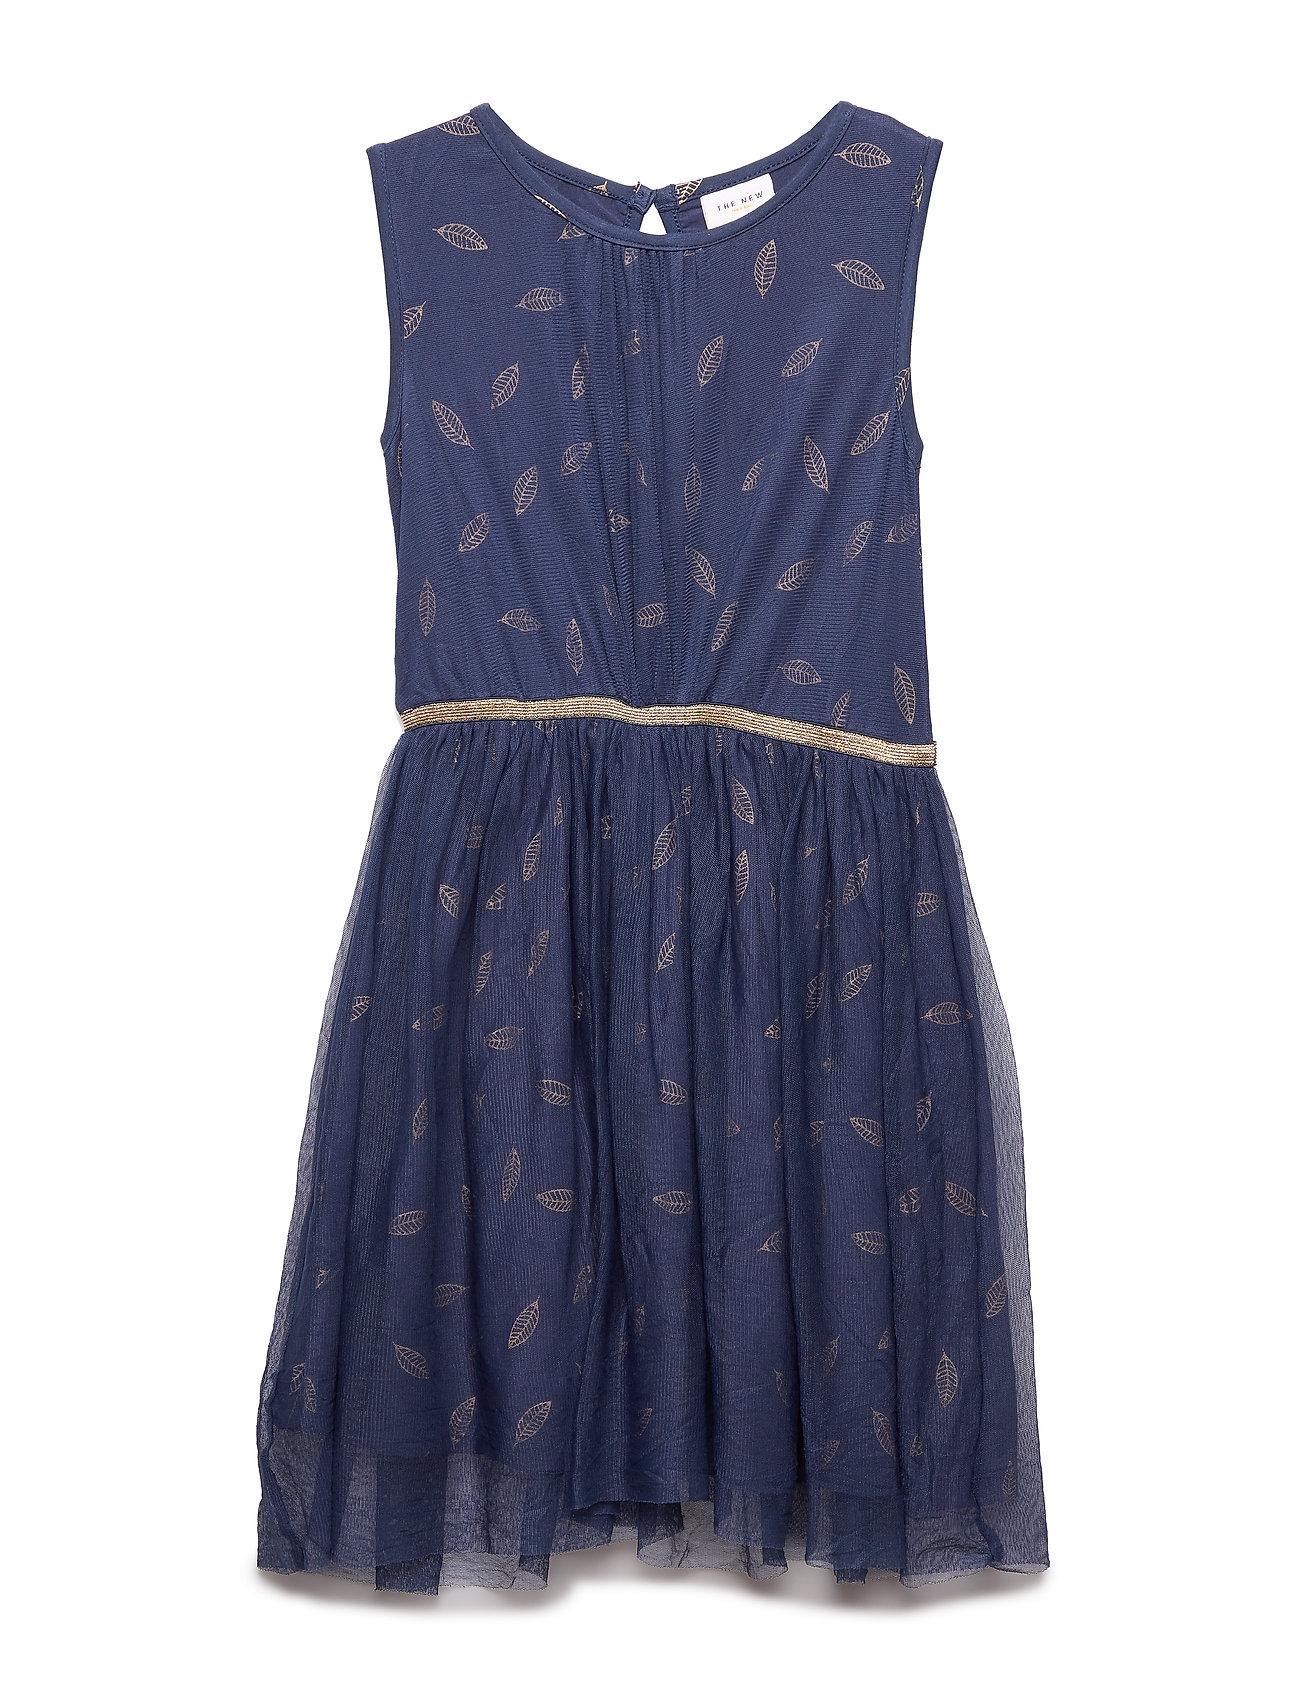 Image of Anna Kristel Dress (3105944245)